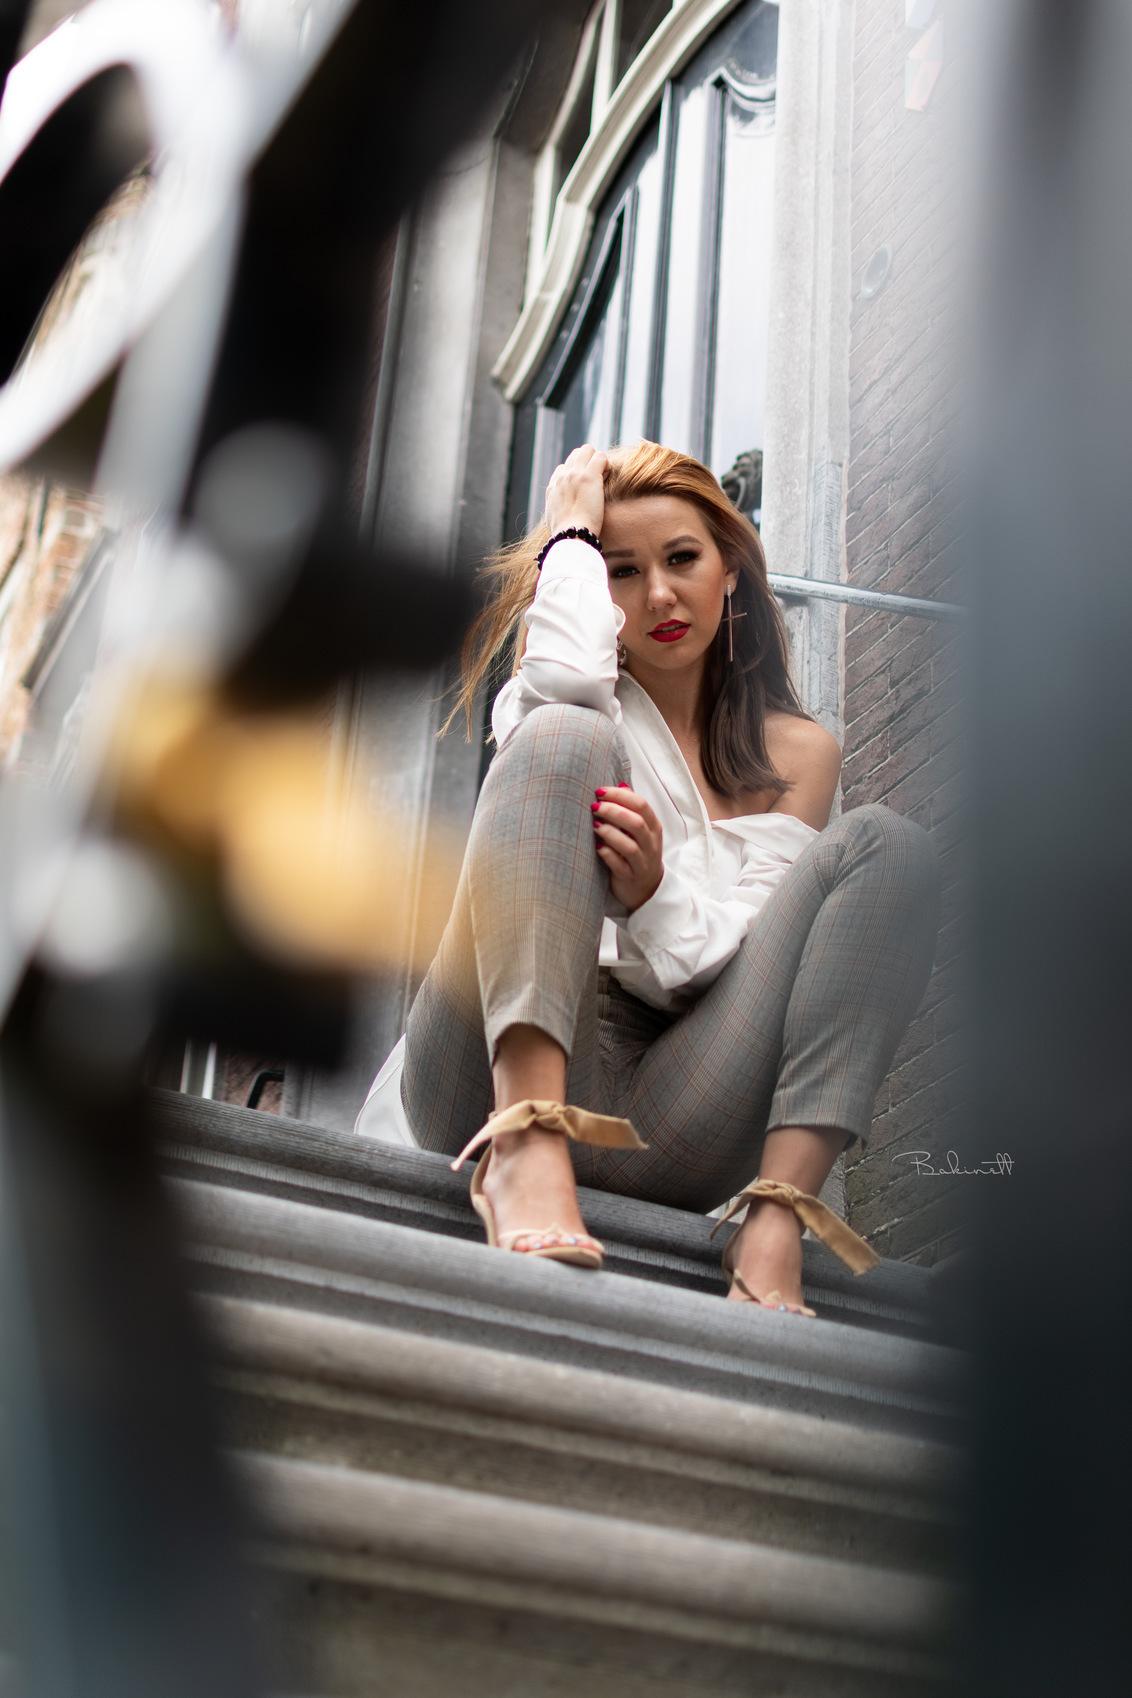 Maagby - - - foto door Bakinett op 20-09-2020 - deze foto bevat: man, vrouw, kleur, water, natuur, licht, portret, reclame, model, bos, tegenlicht, flits, stoer, haar, fashion, vintage, meisje, lief, lippen, beauty, schoenen, zwartwit, sfeer, pose, bruiloft, lingerie, glamour, studio, kapsel, belichting, expressie, jurk, jeans, mode, magazine, fotoshoot, retro, kleding, romantisch, urbex, visagie, locatie, workshop, makeup, bokeh, commercial, styling, editorial, strobist, urban exploring, fashionfotografie